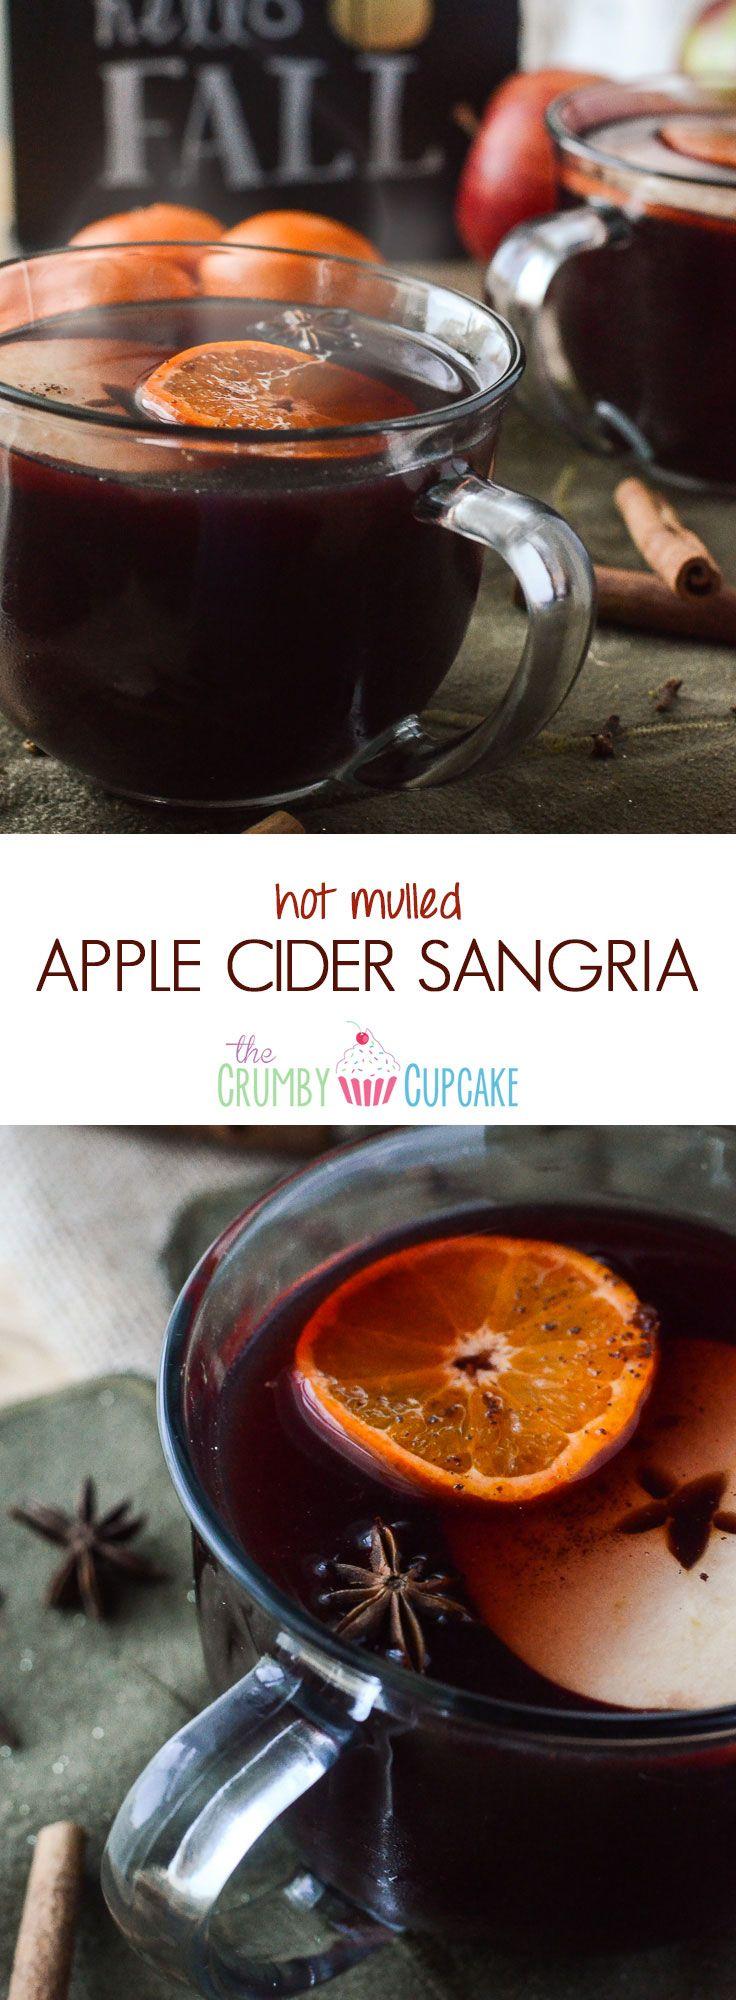 hot mulled apple cider sangria hot mulled apple cider sangria it s the ...